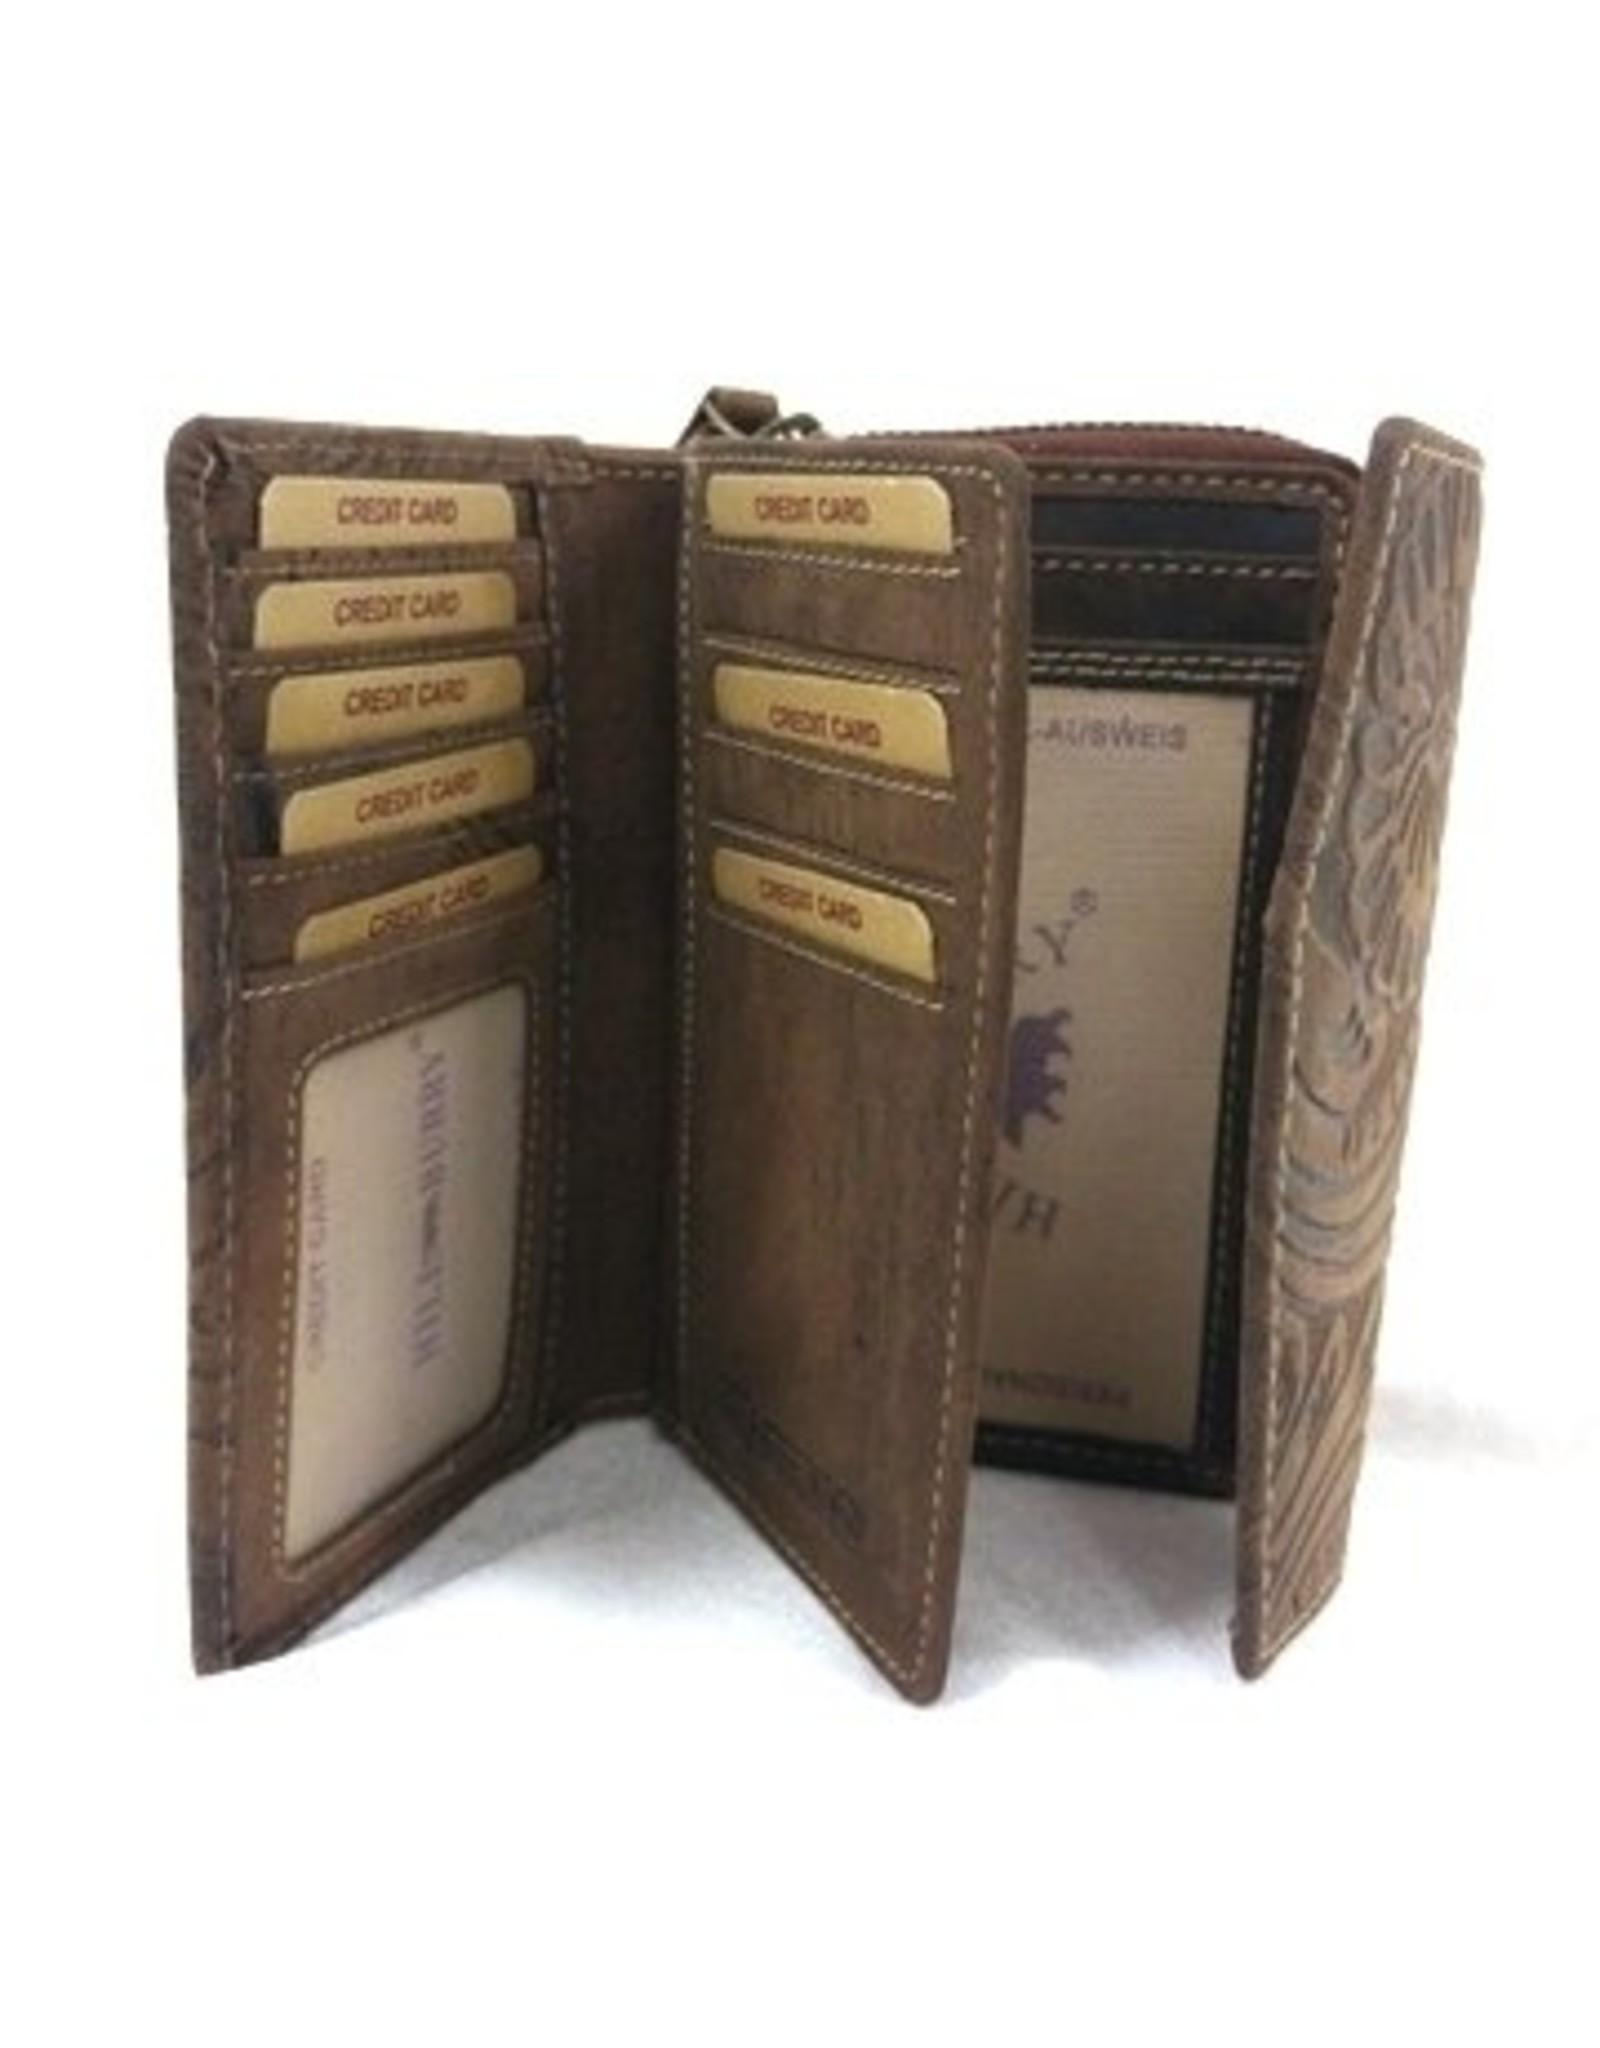 HillBurry Leren portemonnees - Leren Portemonnee HillBurry 1309F-dbr